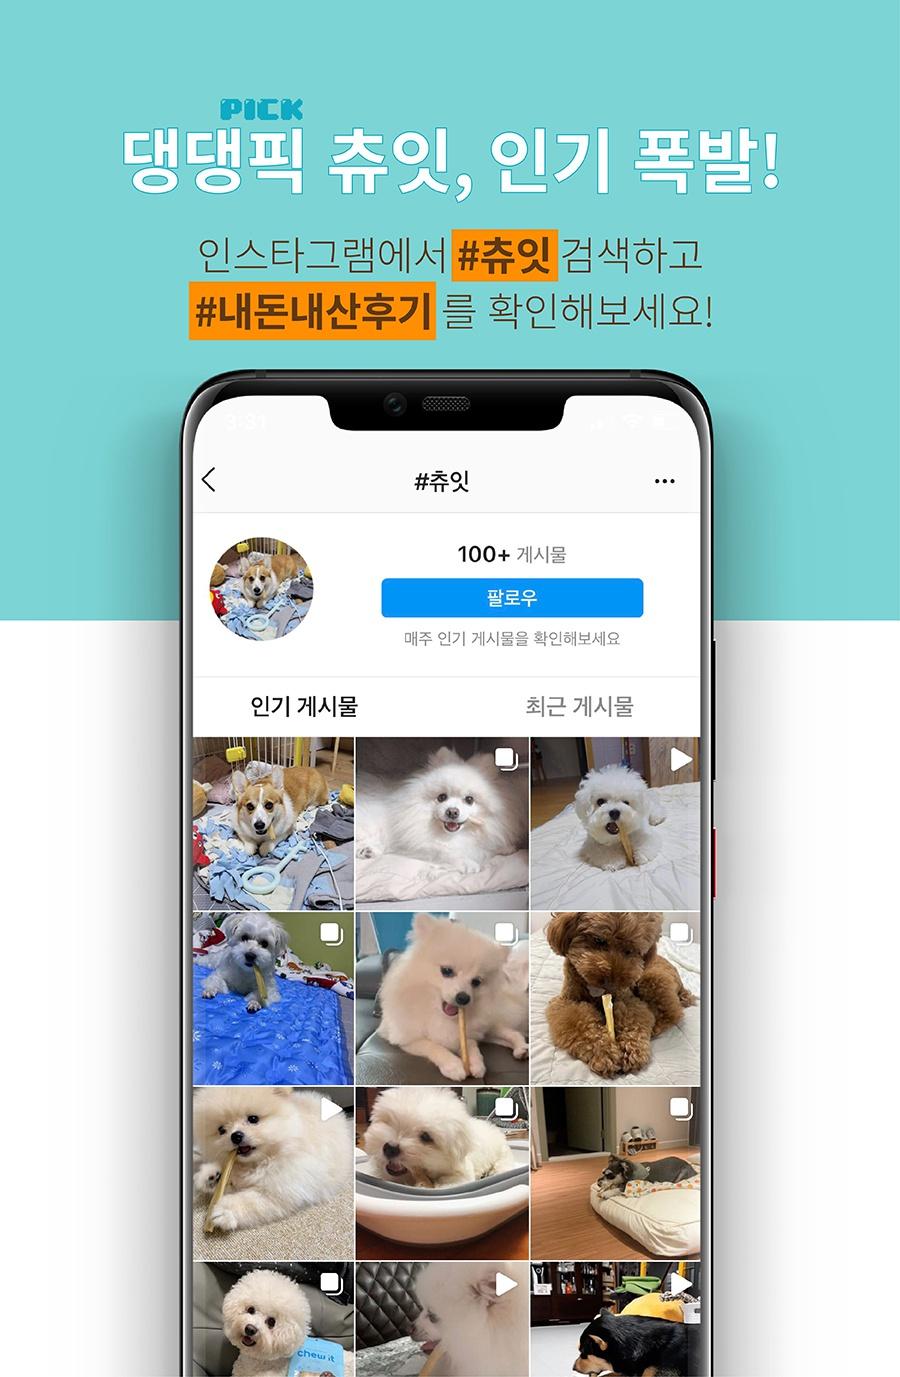 it 츄잇 (플레인/피넛버터/산양유/마누카꿀)-상품이미지-2